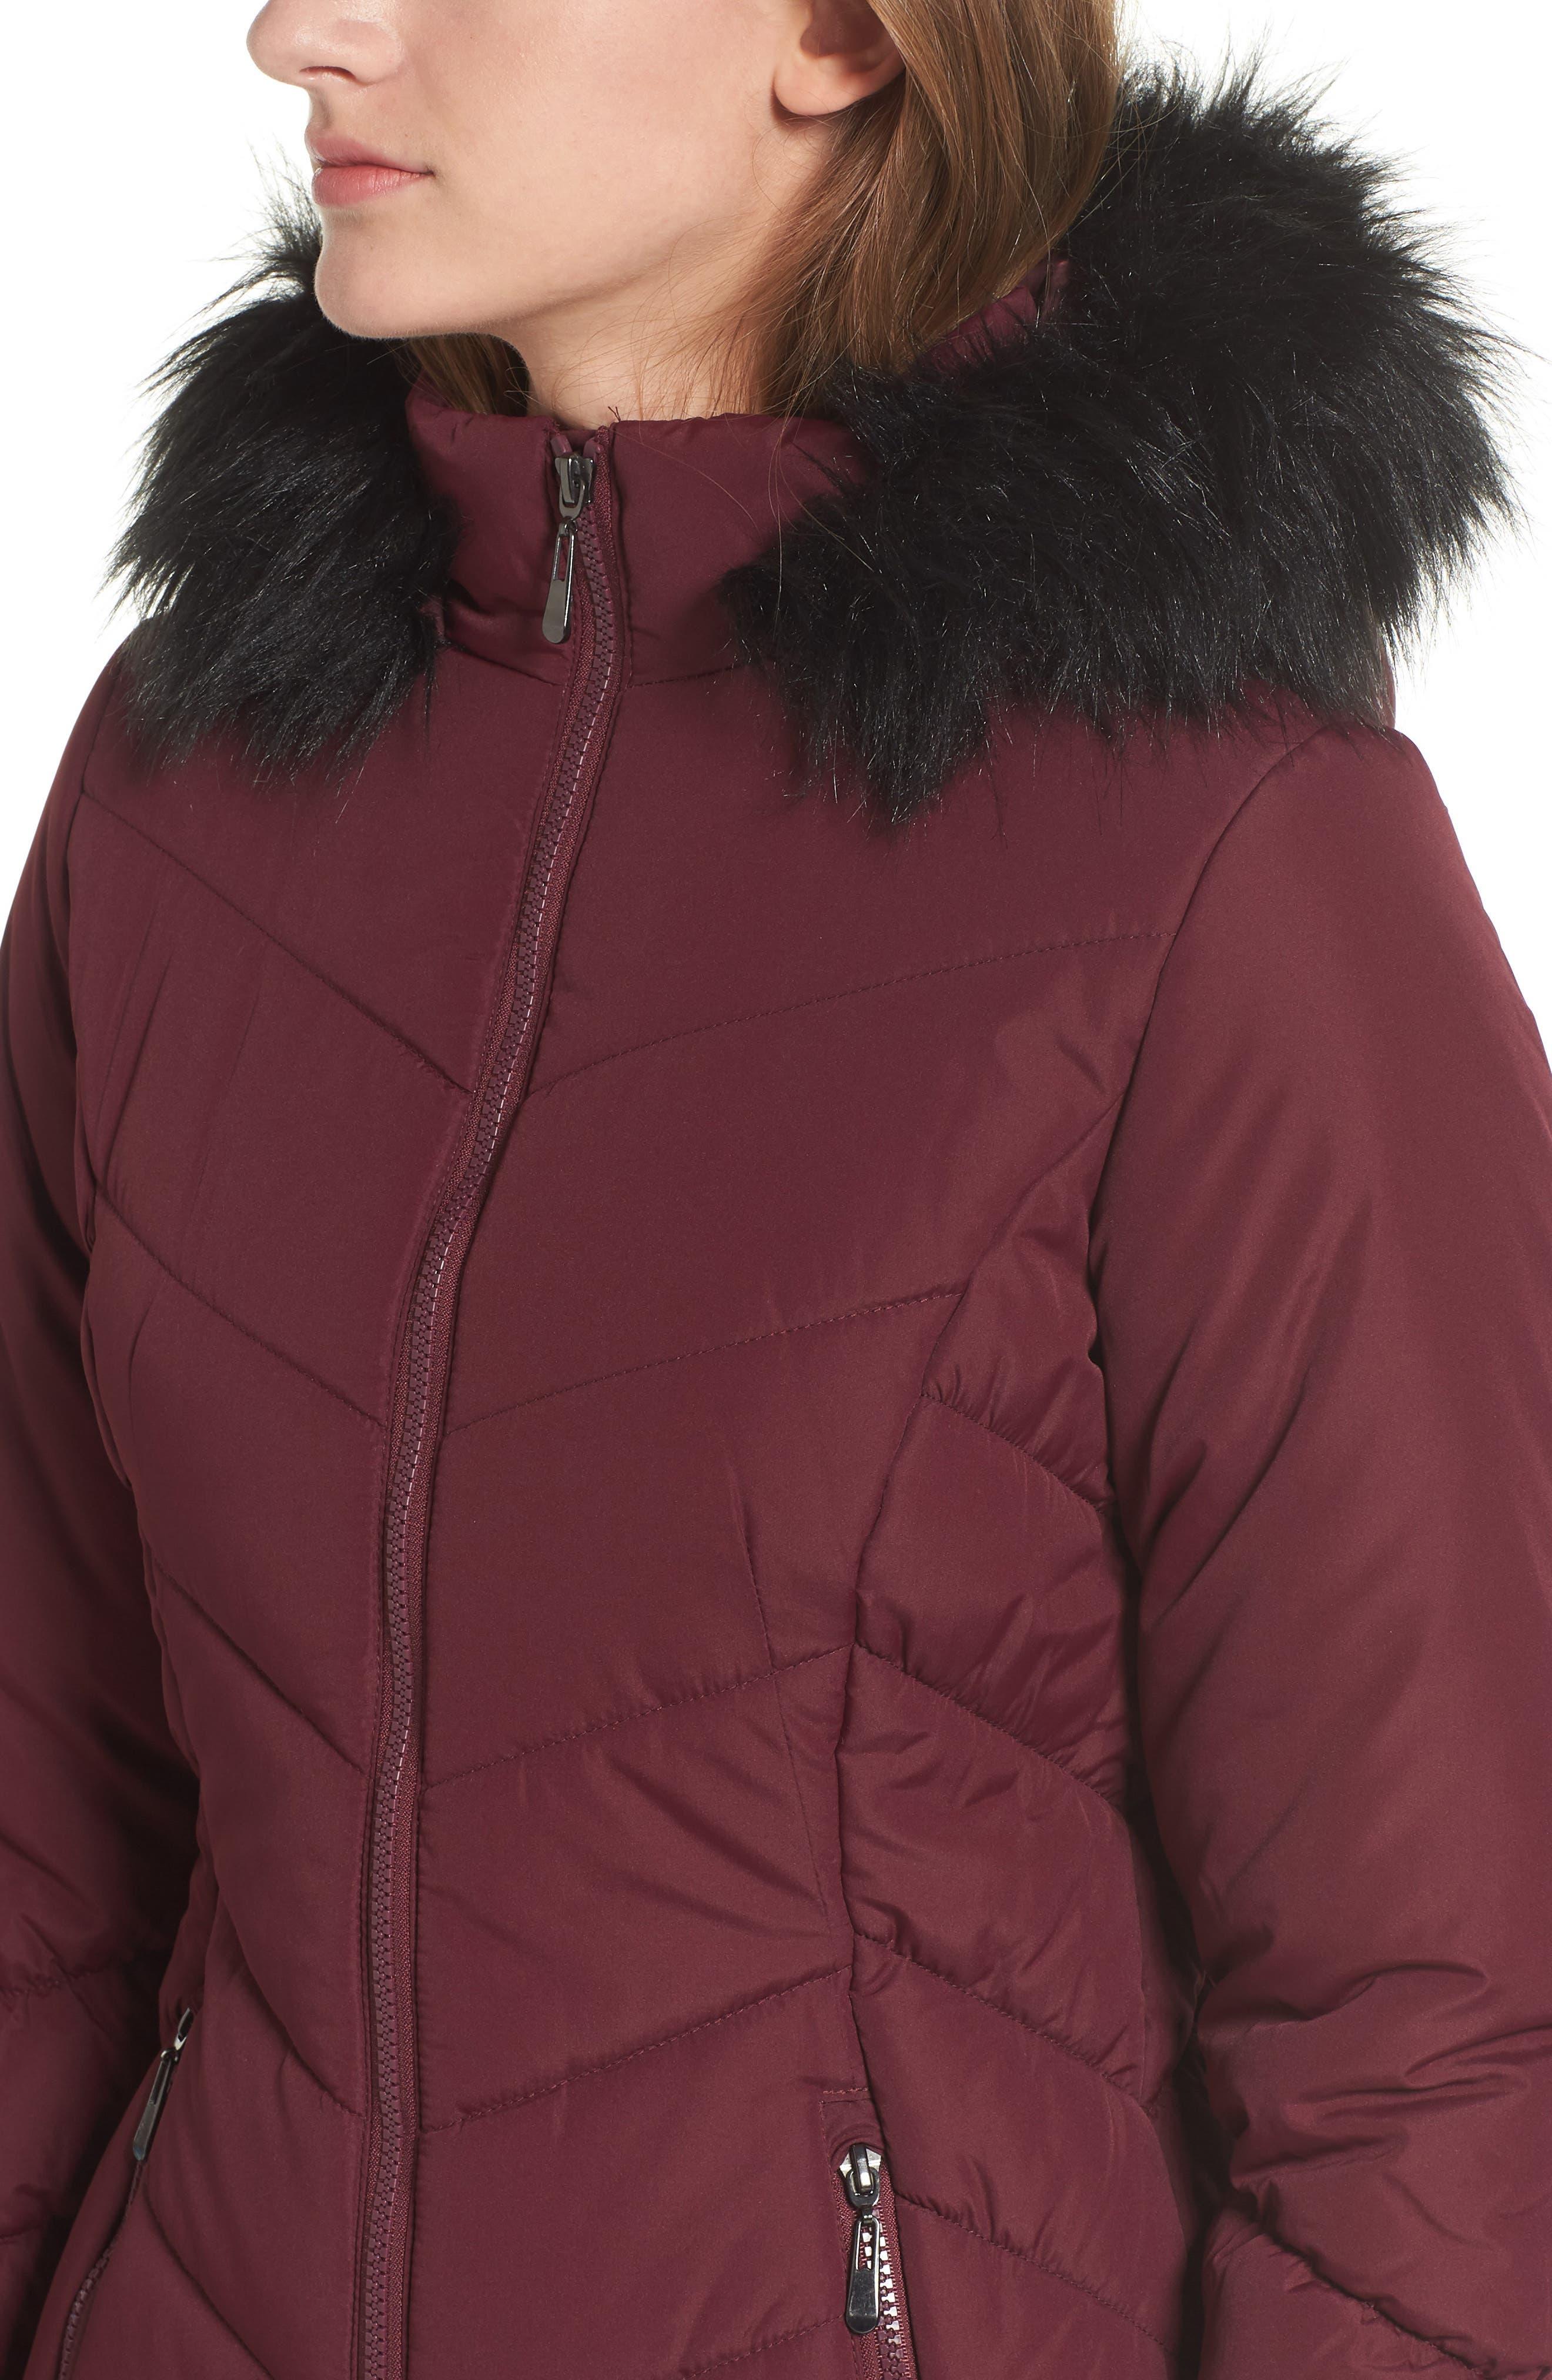 Faux Fur Trim Hooded Puffer Jacket,                             Alternate thumbnail 4, color,                             930